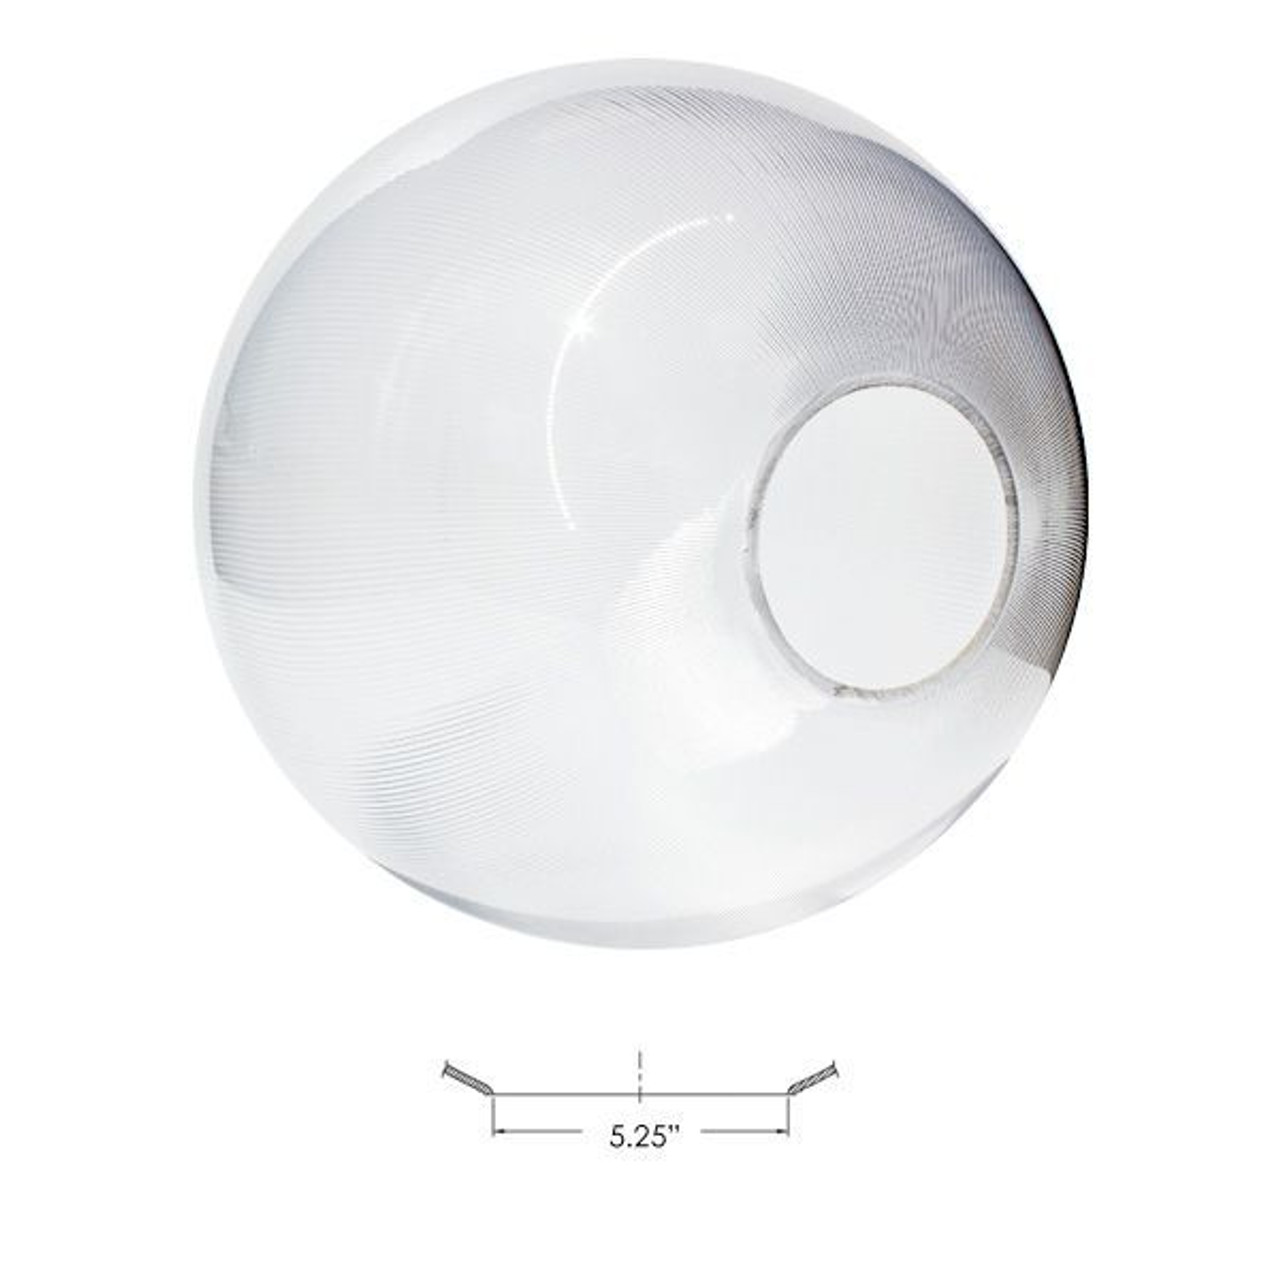 "18/"" Acrylic Clear Plastic Round Globe Outdoor Street Light Fixture Pole 5.25/"""